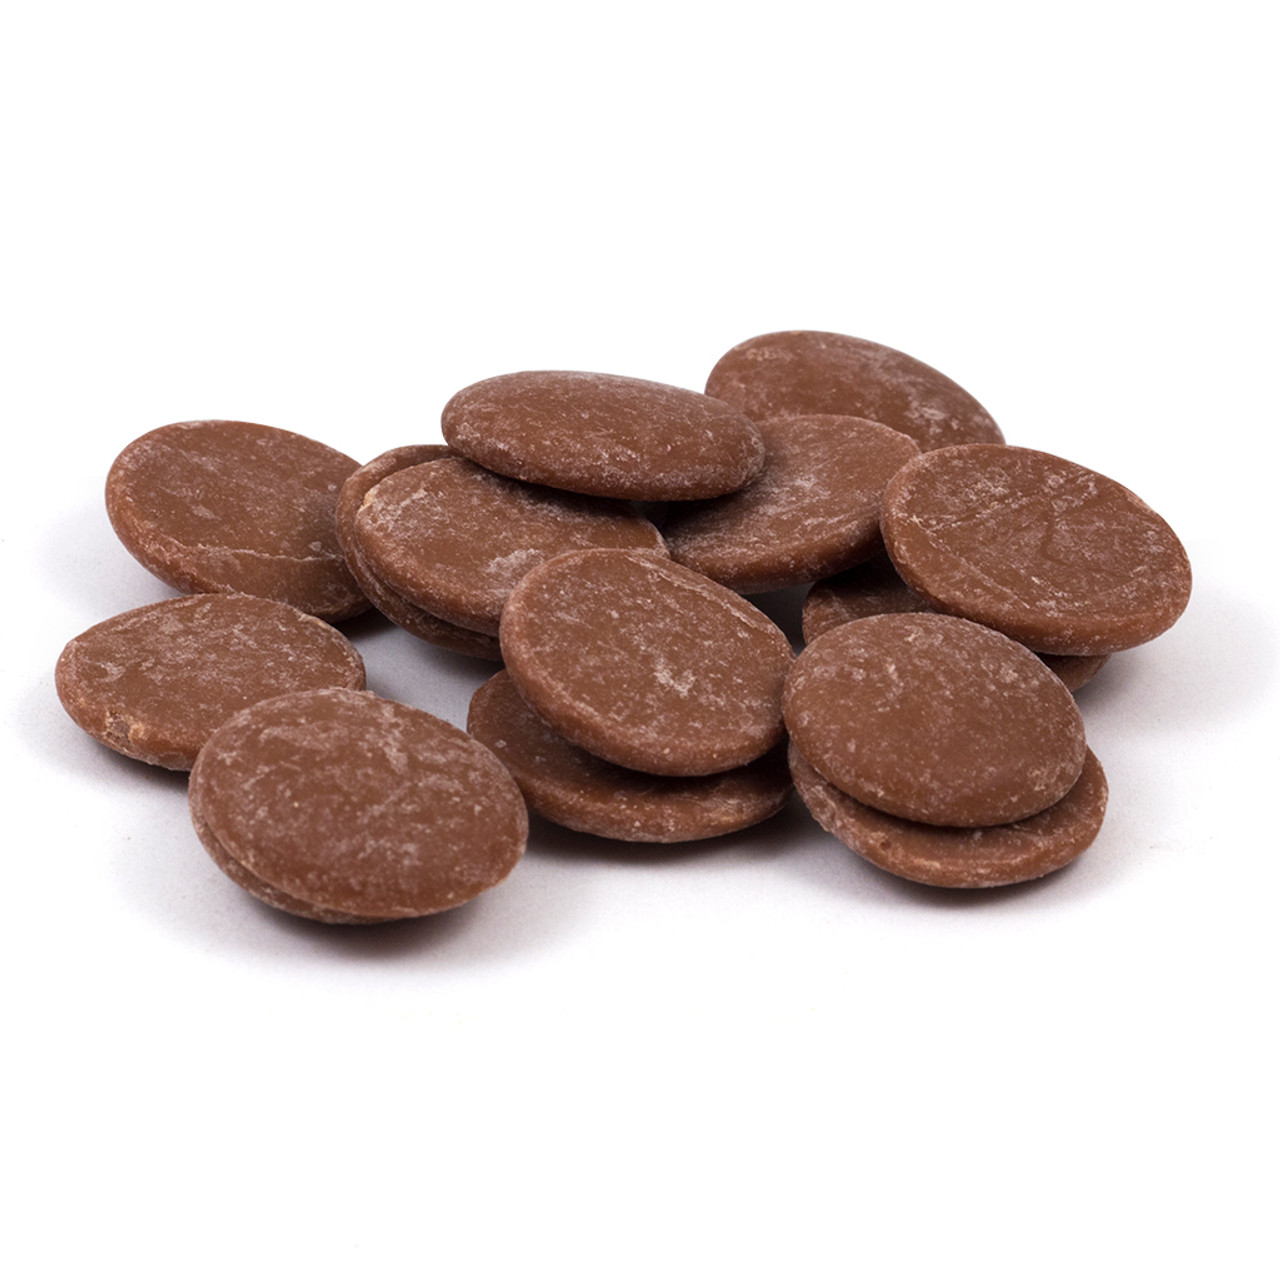 Chocolate Callets Callebaut 150g Caramel